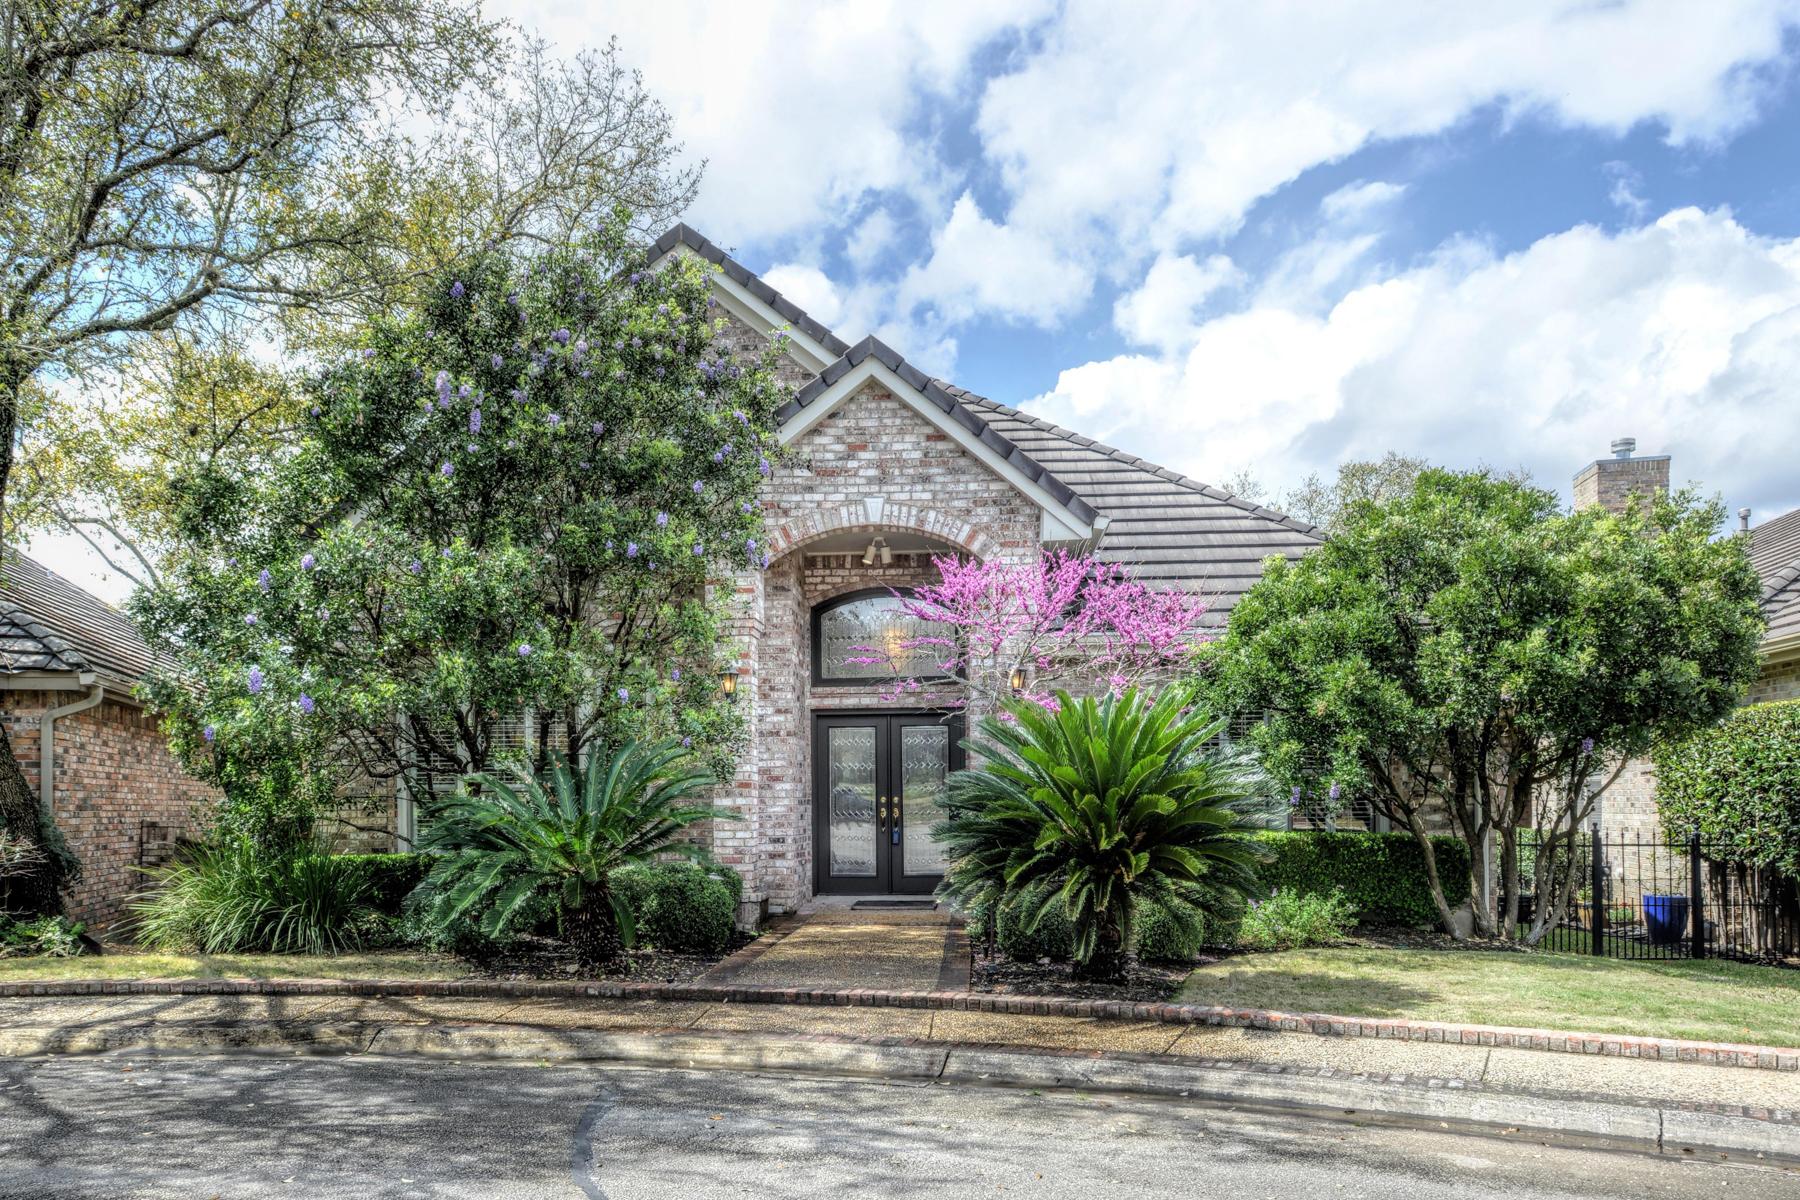 Single Family Home for Sale at Stunning Dominion Garden Home 4 Hendon Ln San Antonio, Texas 78257 United States